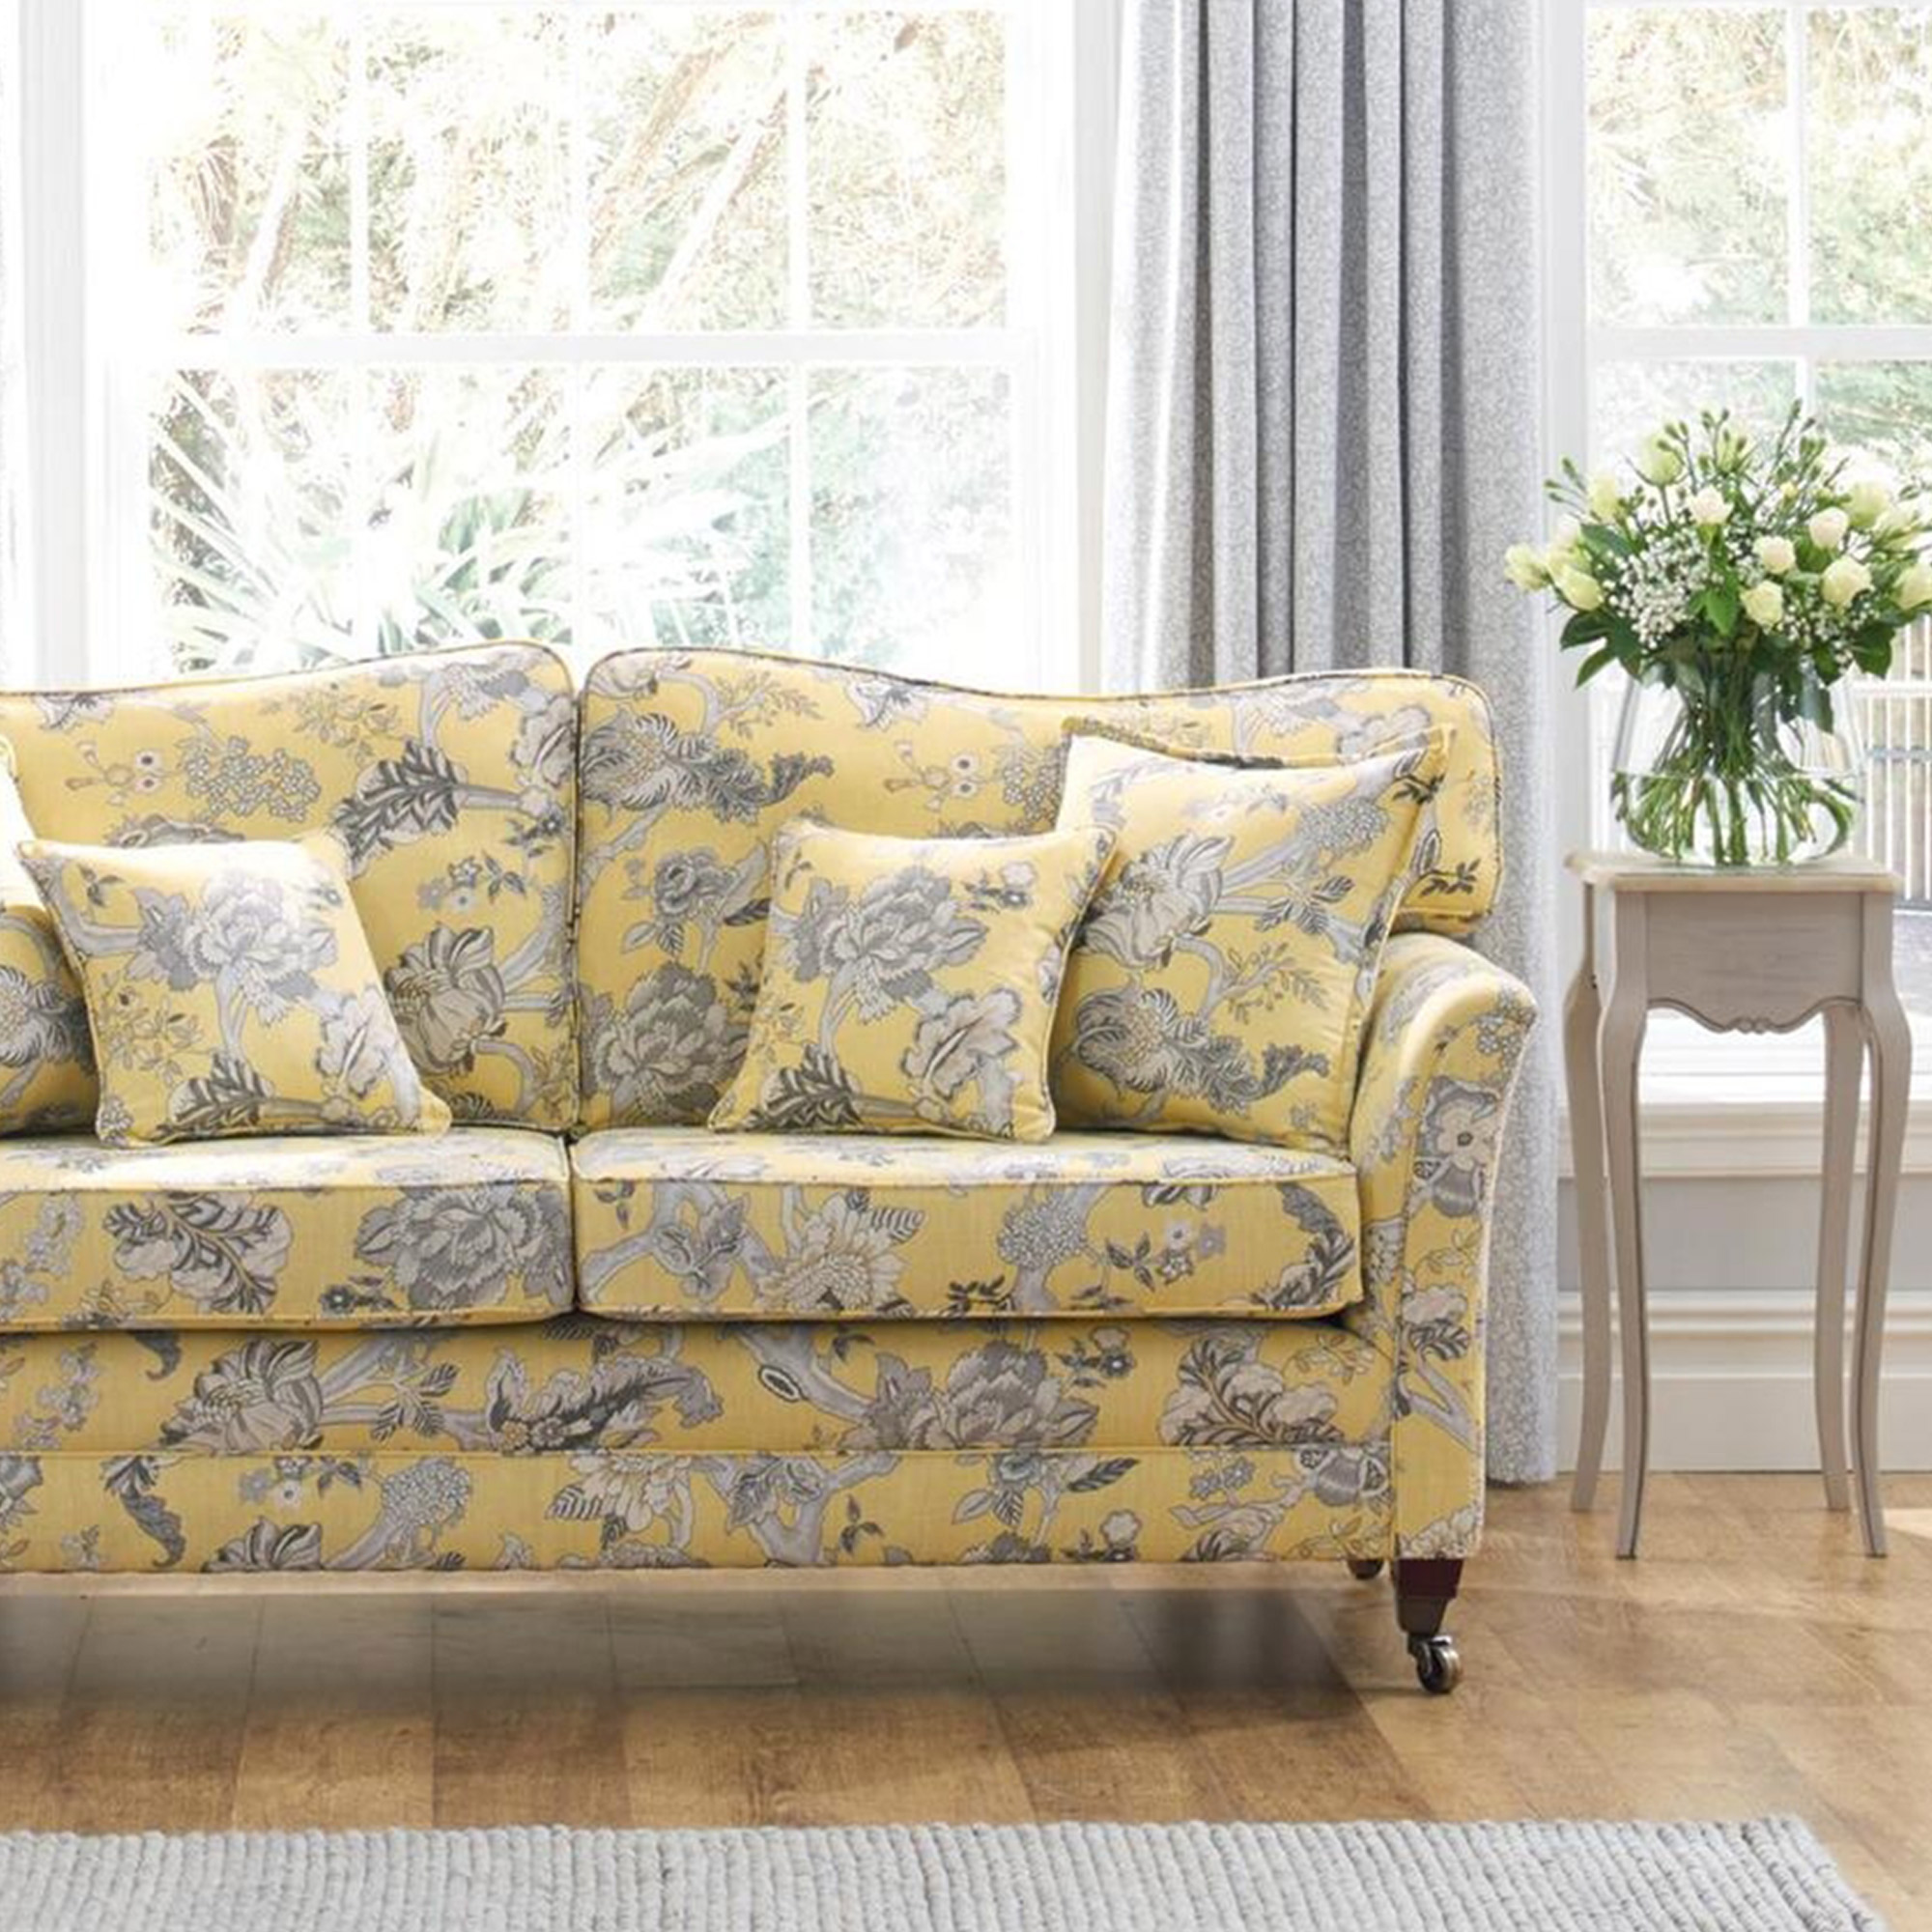 Fabric Details Blenheim Saffron